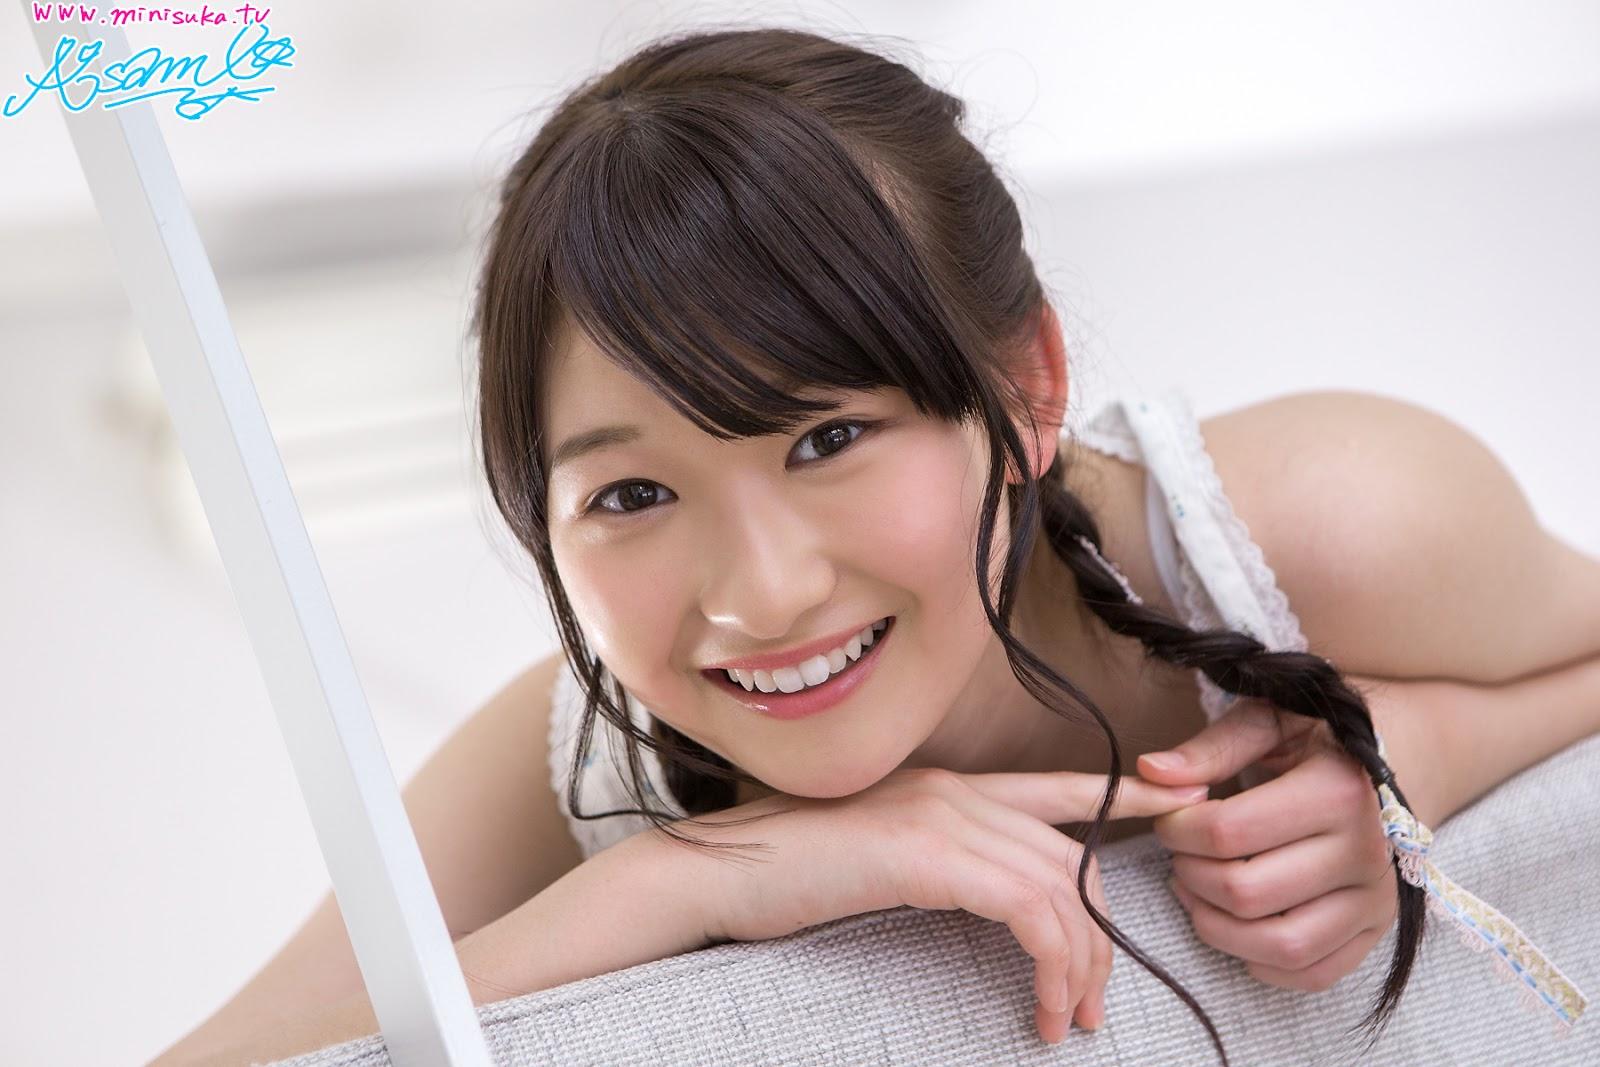 100+ Minisuka Tv Kondou Asami Sexy